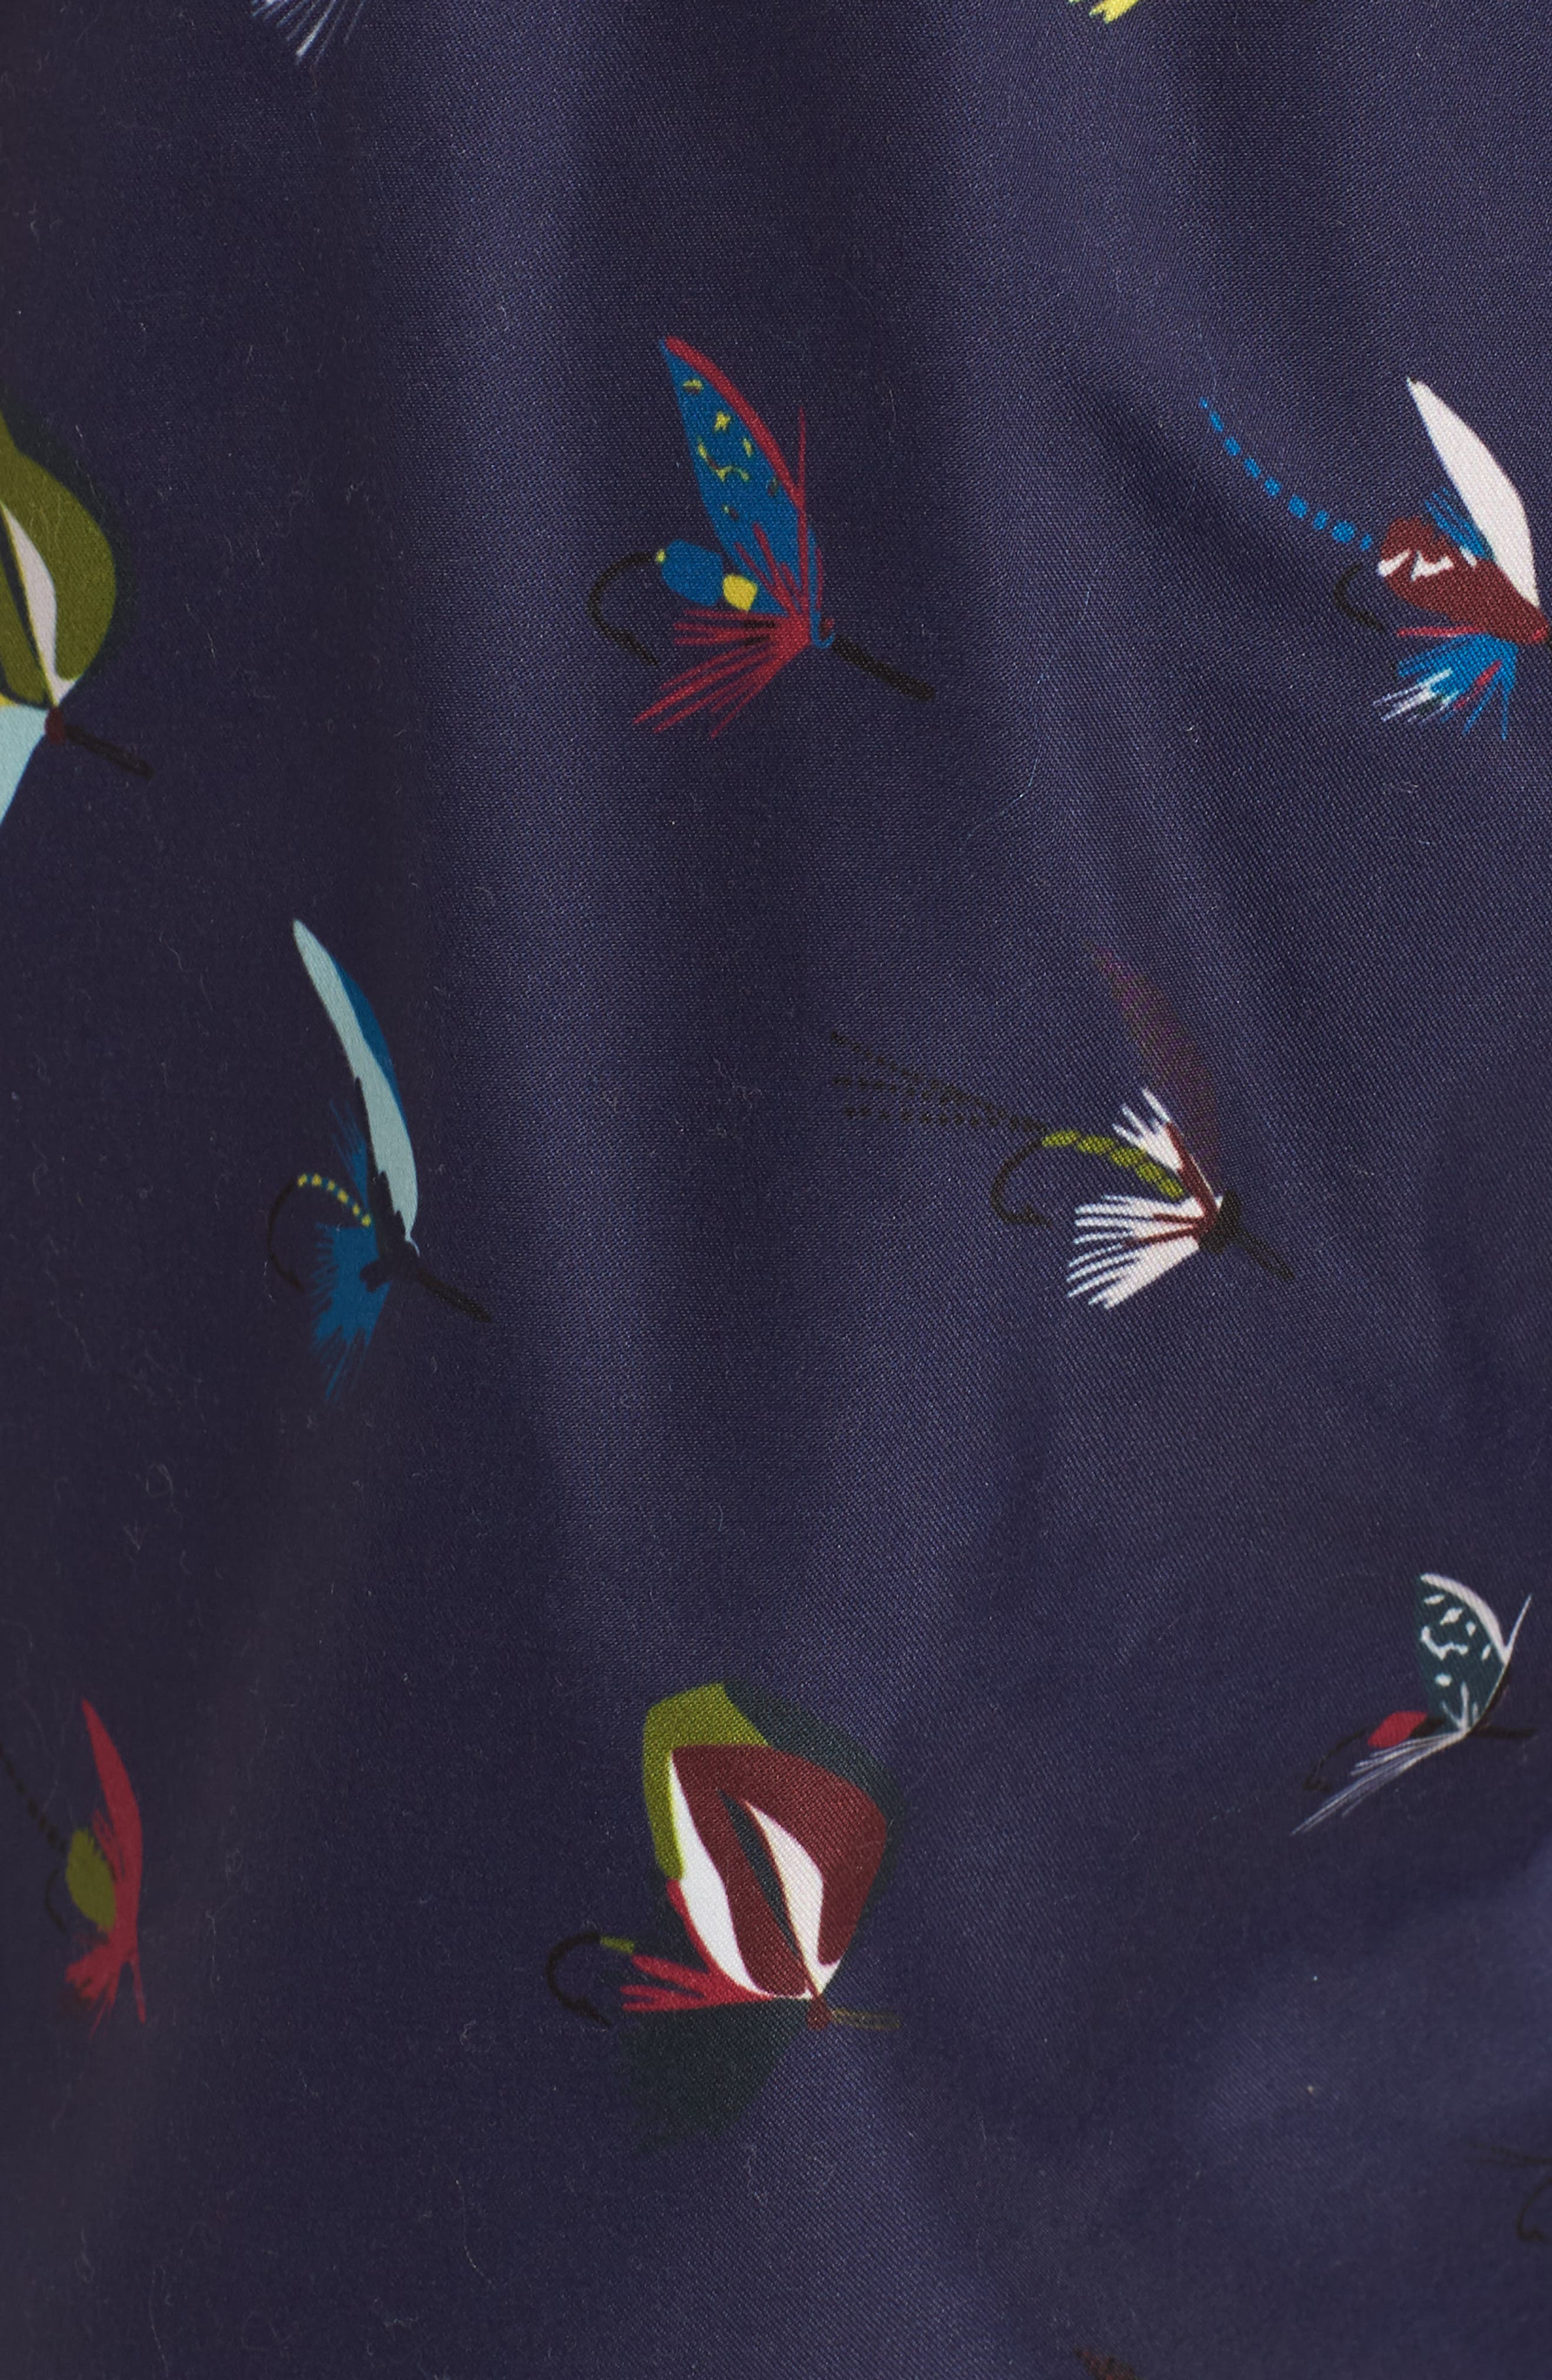 Fish Fly Swim Shorts,                             Alternate thumbnail 5, color,                             410